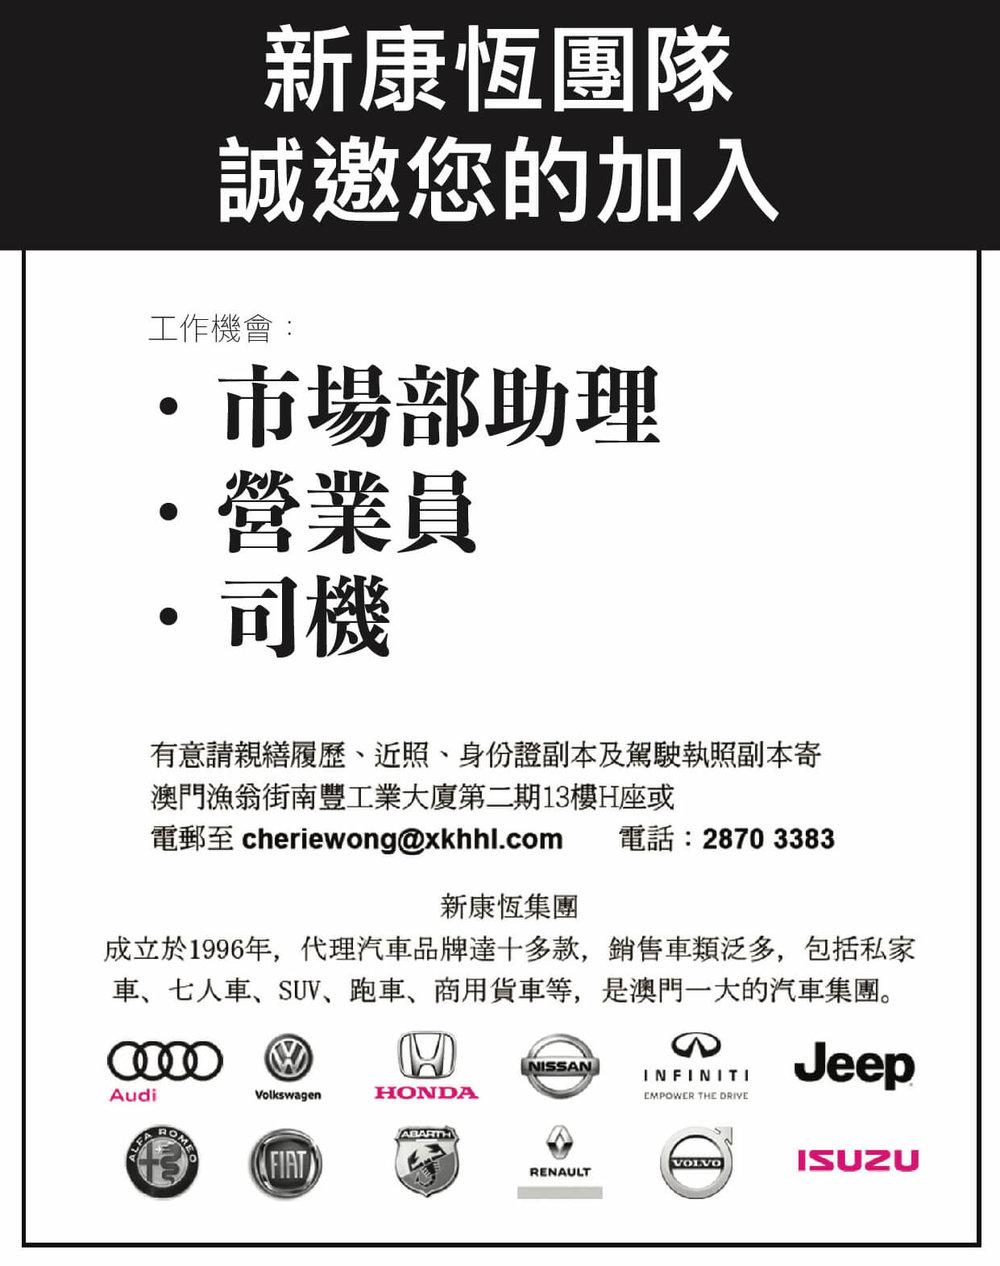 jobscall.me 澳門招聘 - 新康恆-01.jpg